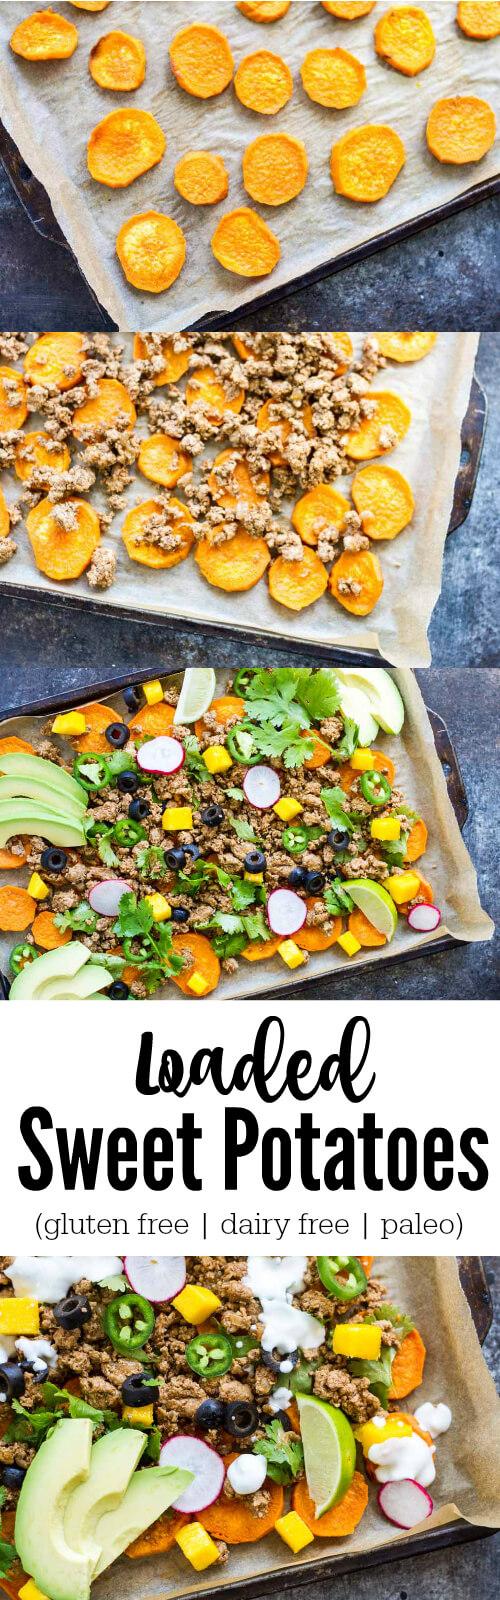 Loaded Sweet Potatoes (gluten free, dairy free, paleo) - www.savorylotus.com